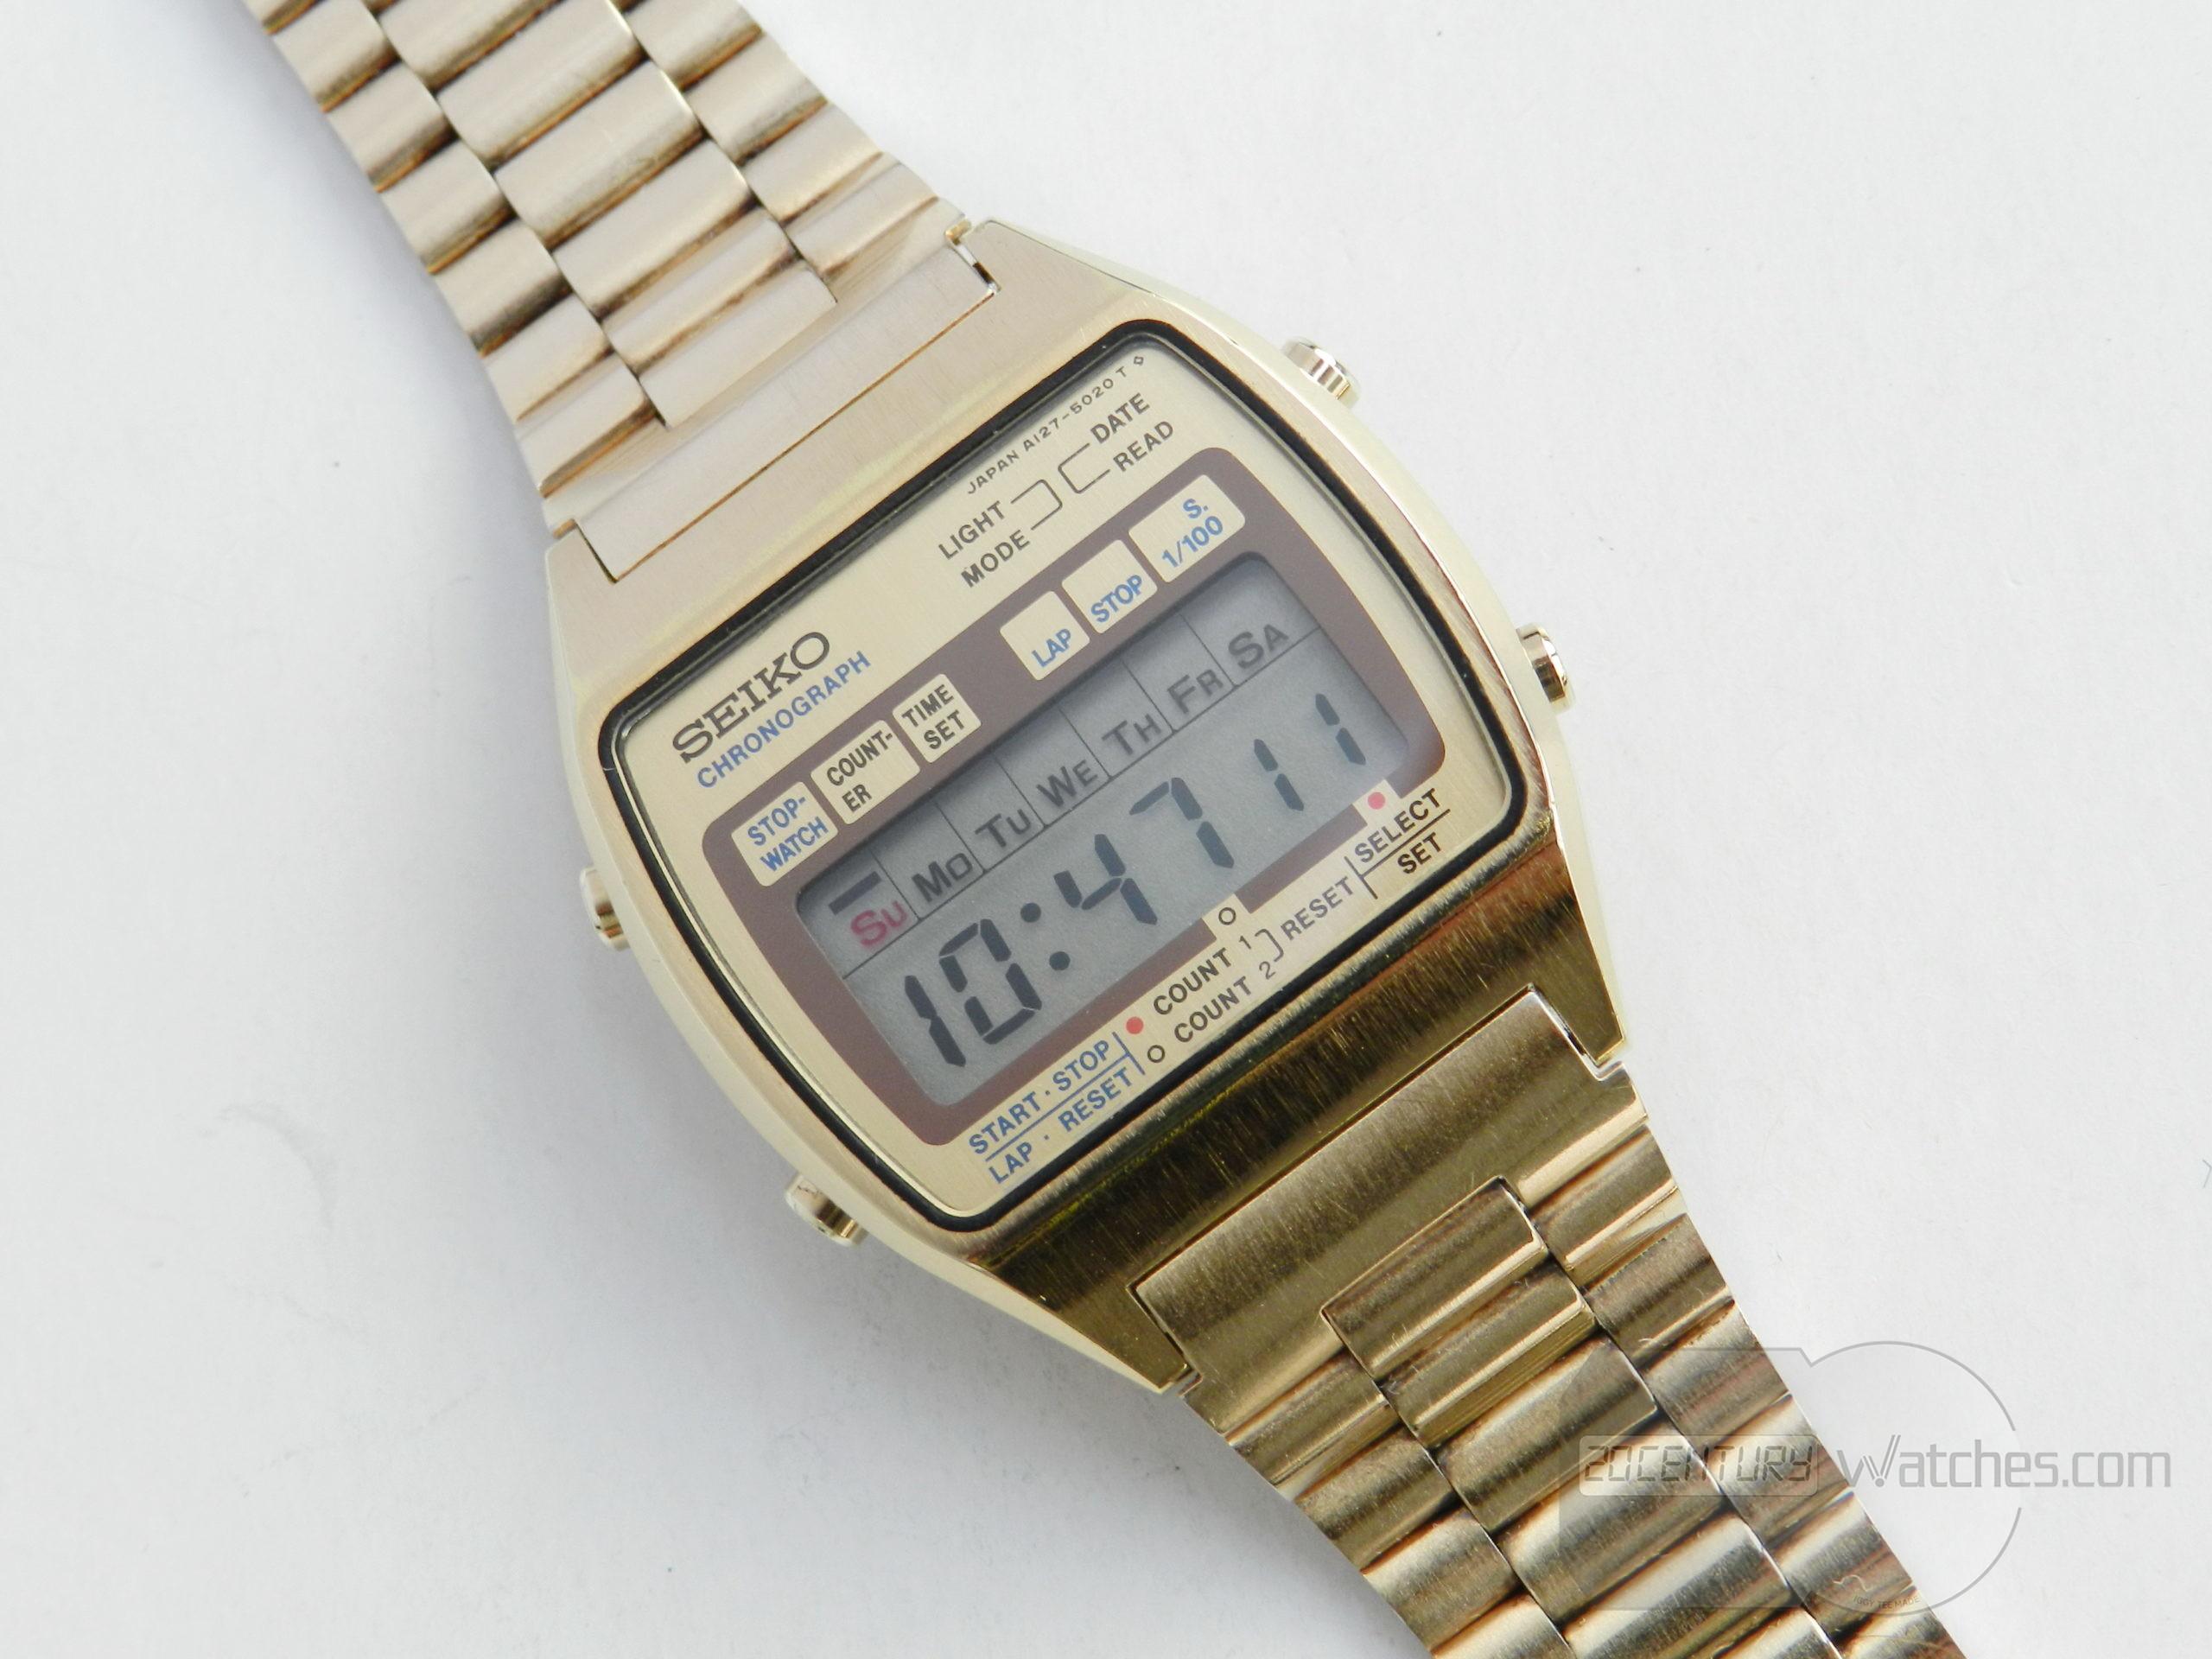 Seiko LCD A127- 5020